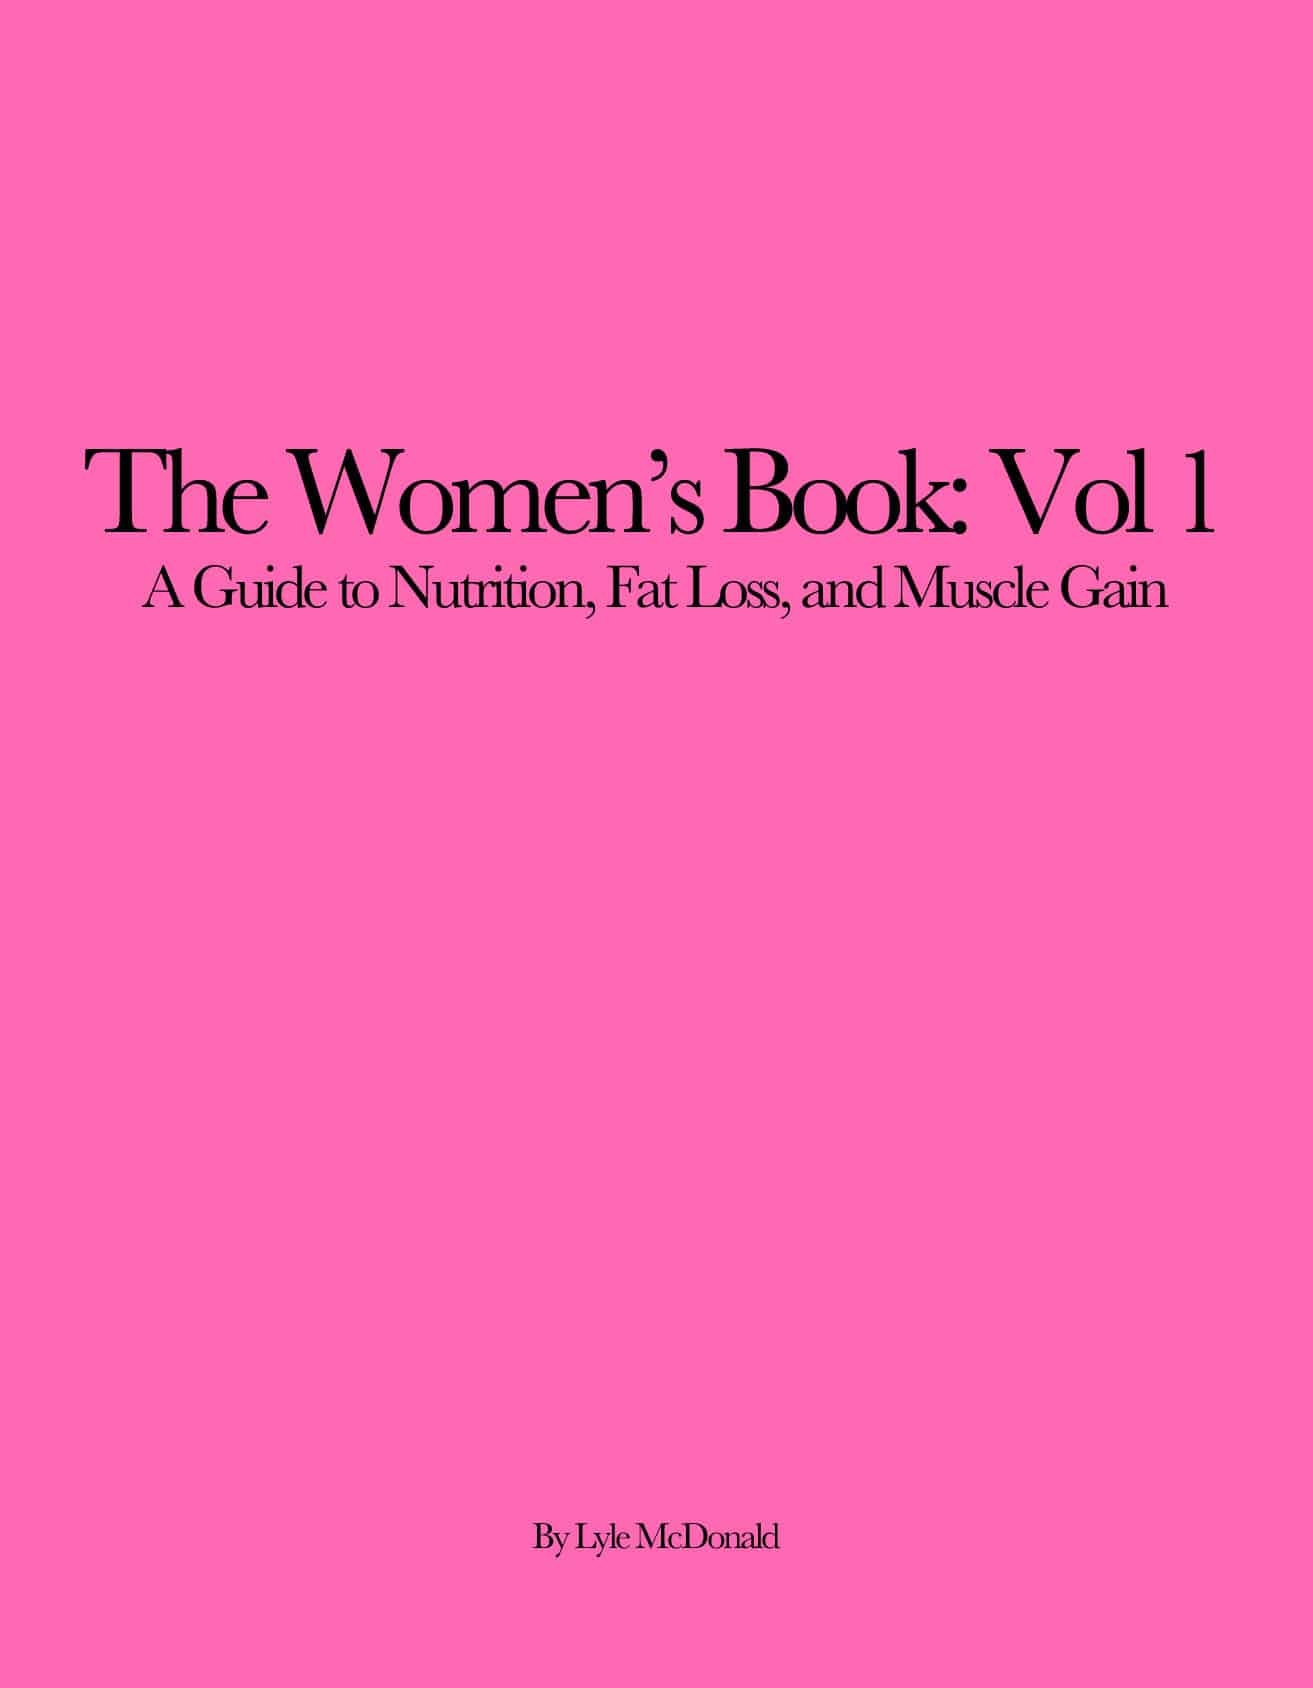 The Women's Book Vol 1